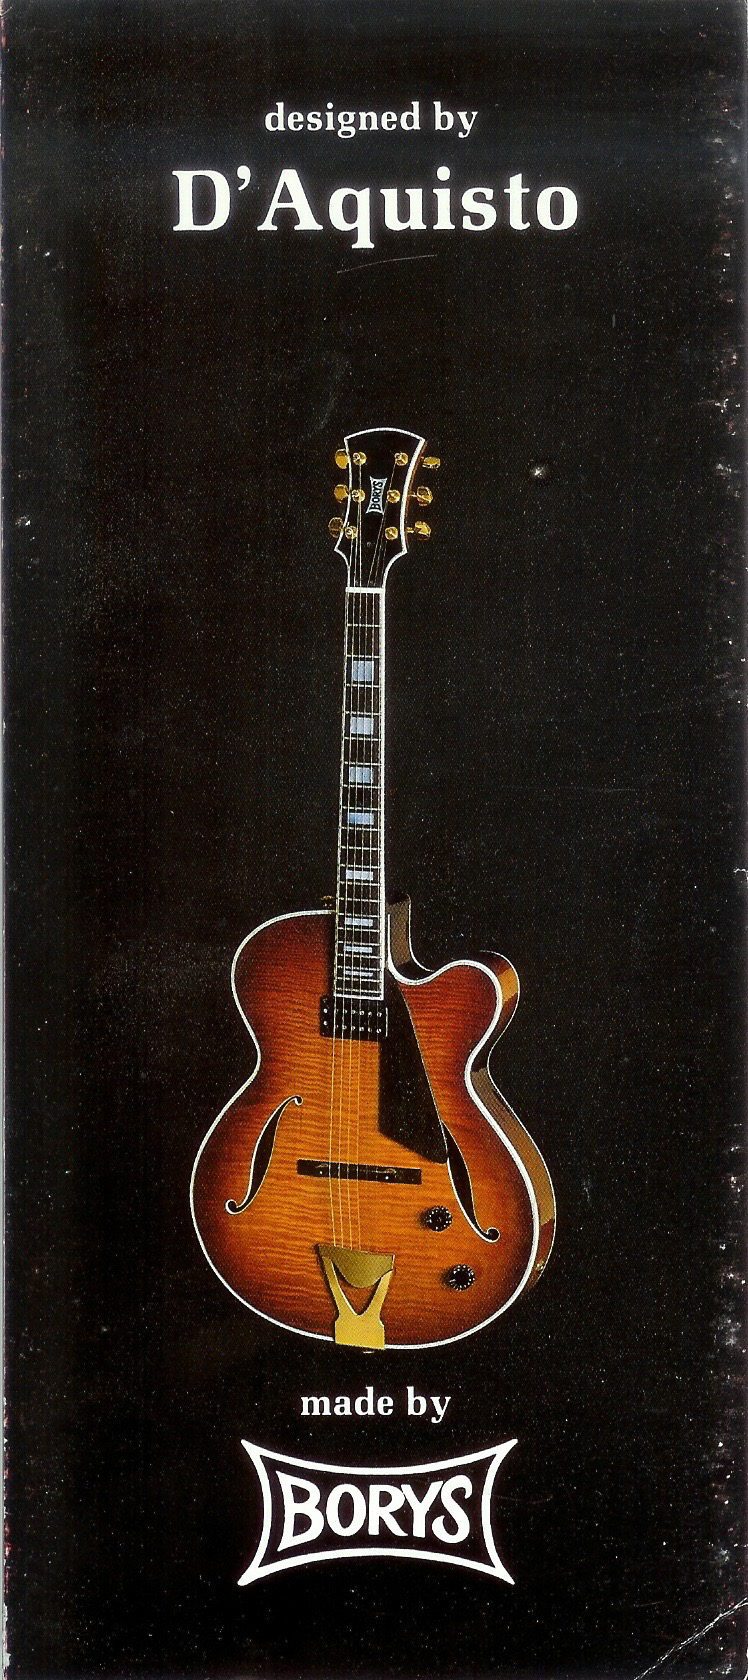 borys_guitars_friends_75.jpg